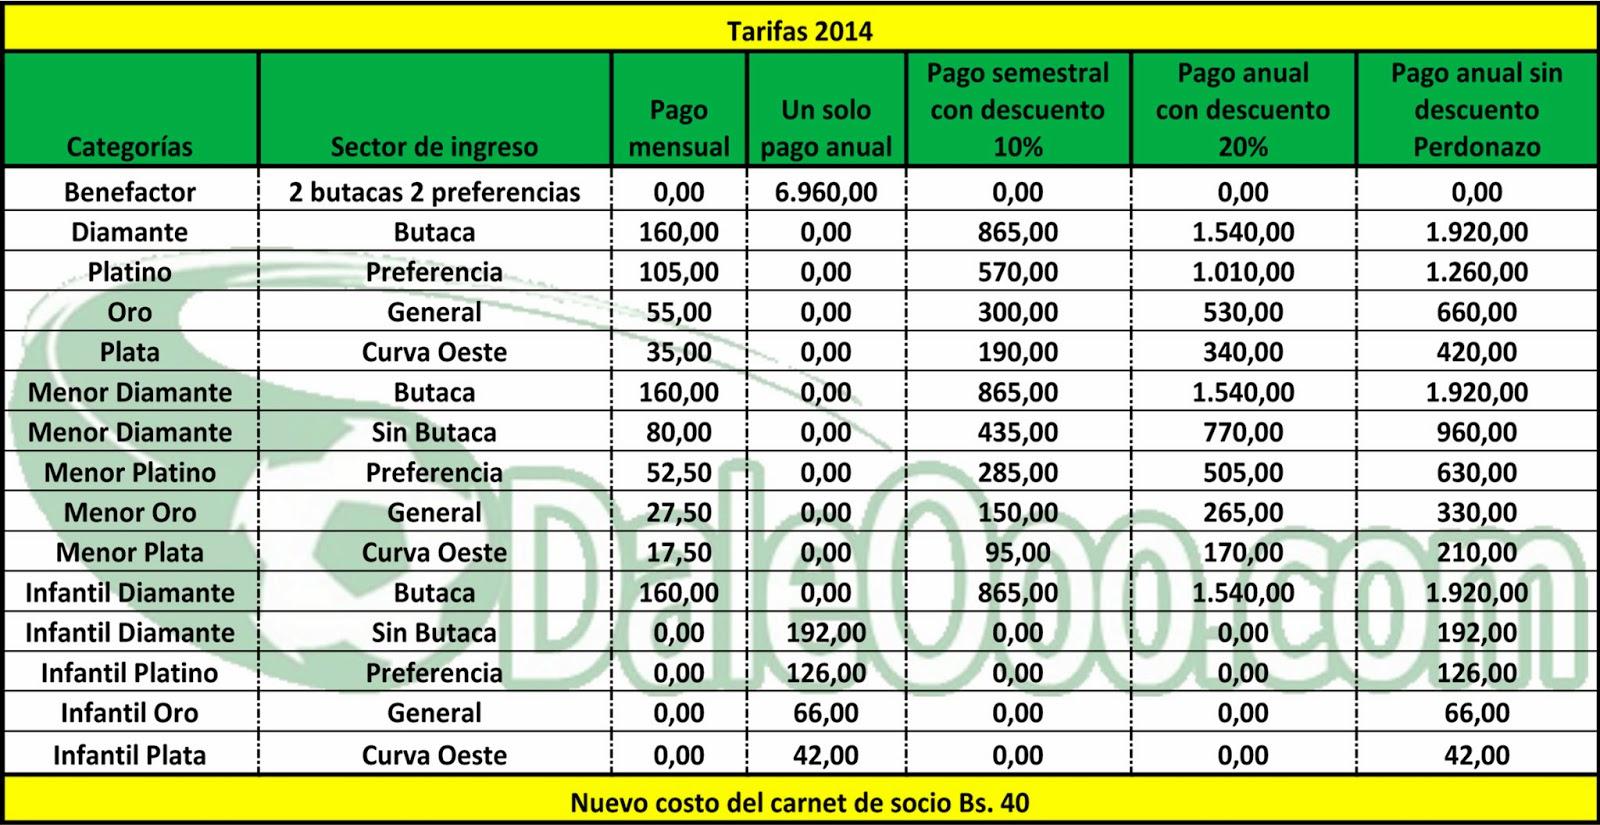 Oriente Petrolero - Tarifa Socios 2014 - DaleOoo.com web del Club Oriente Petrolero